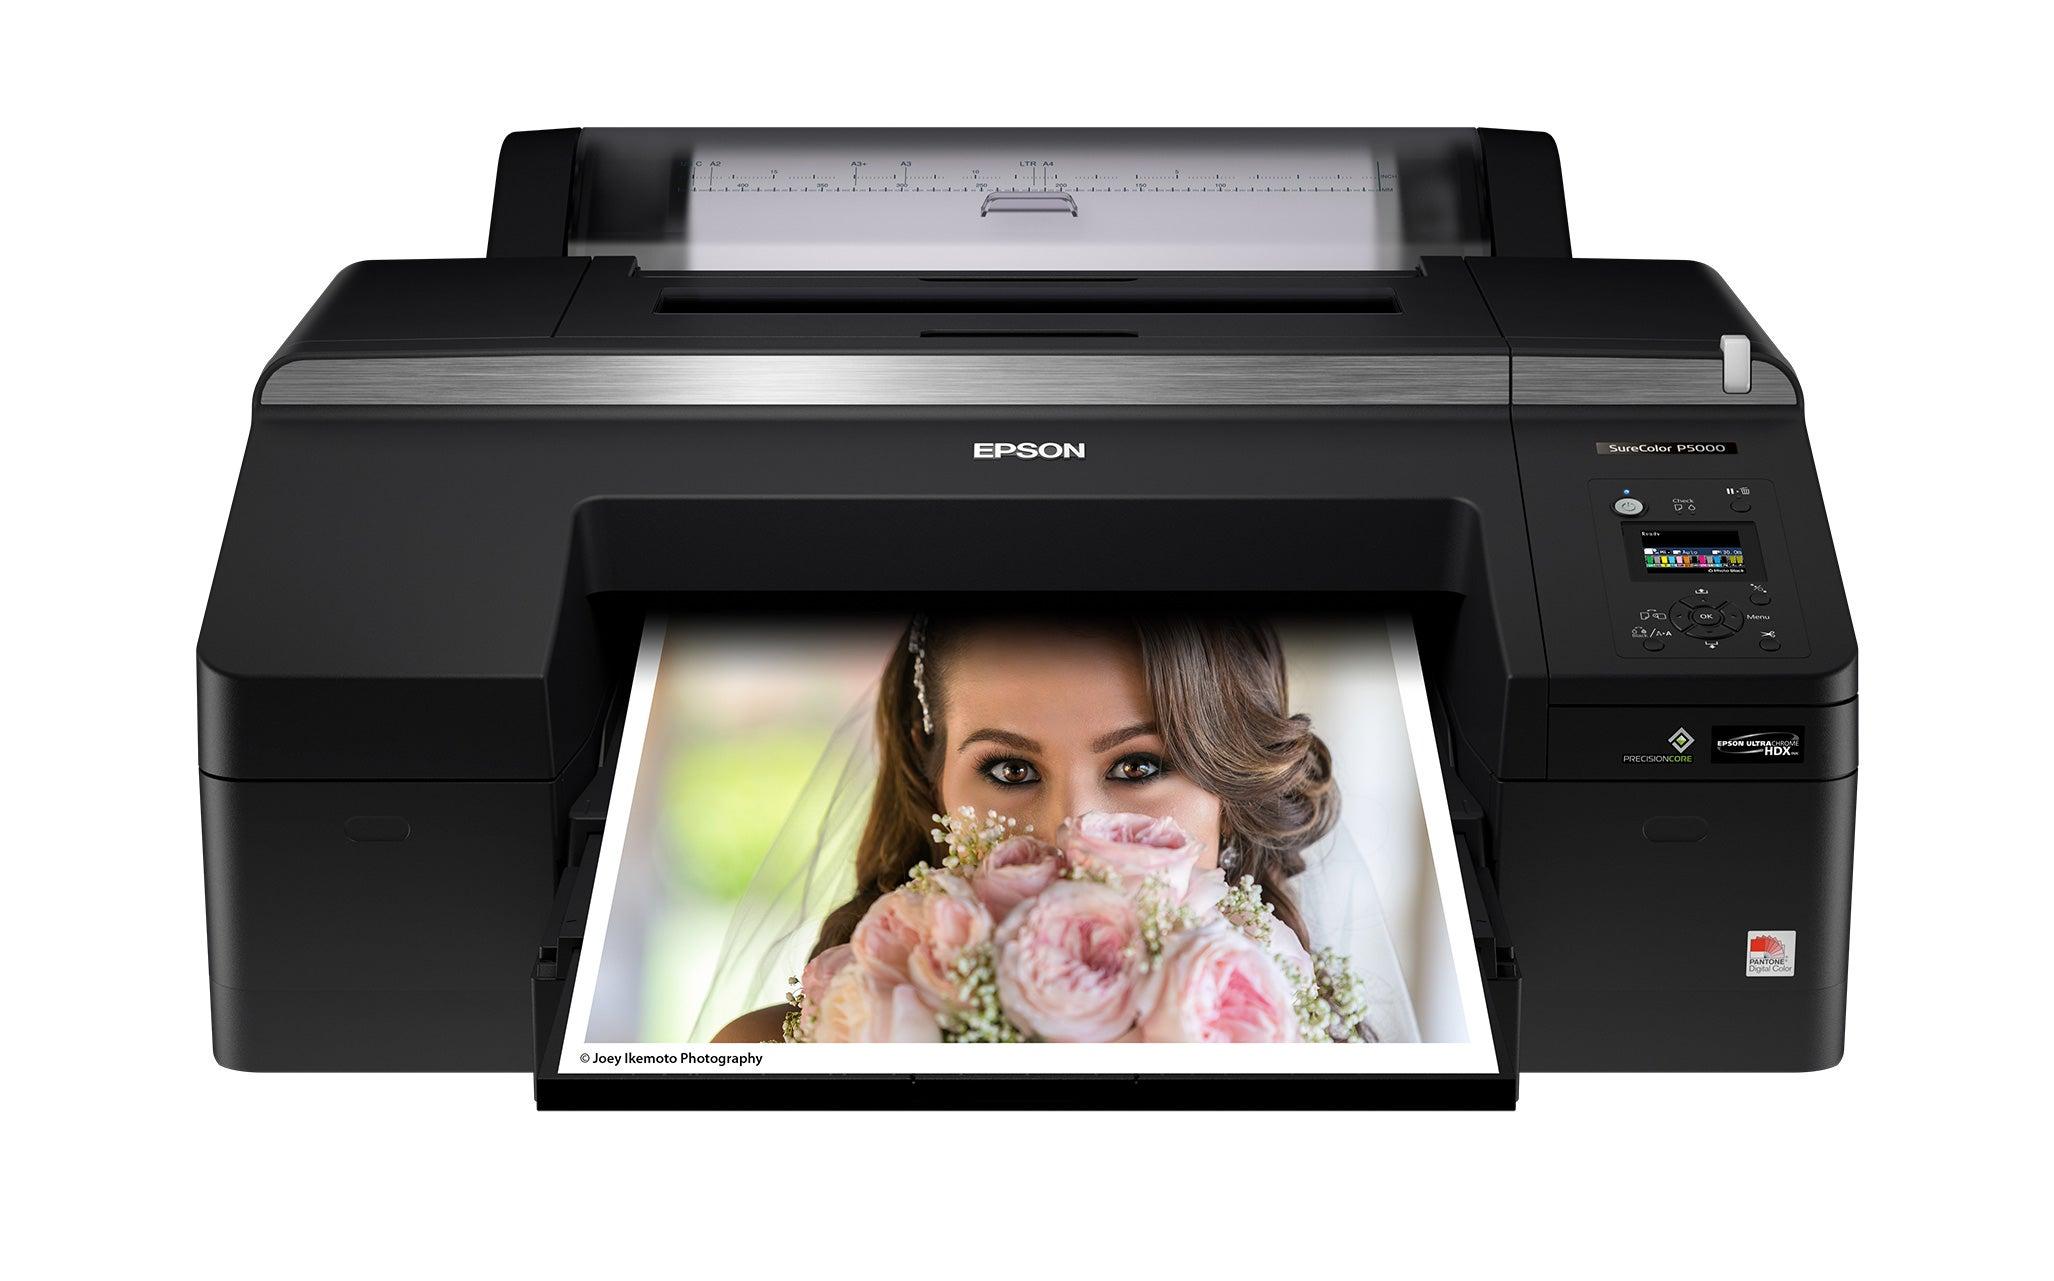 Epson P5000 SureColor Printer